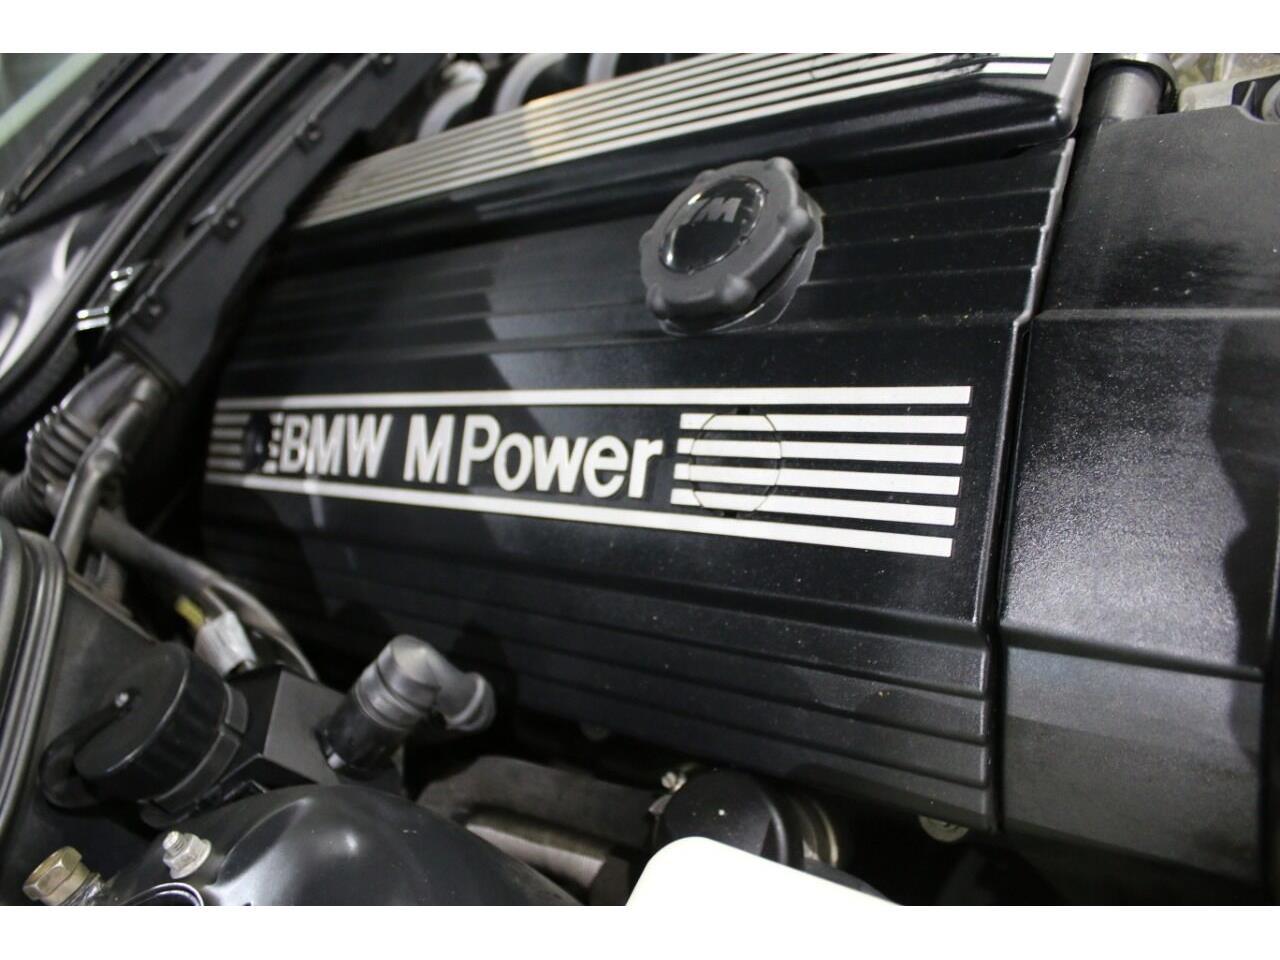 2000 BMW Z3 (CC-1416358) for sale in Hilton, New York